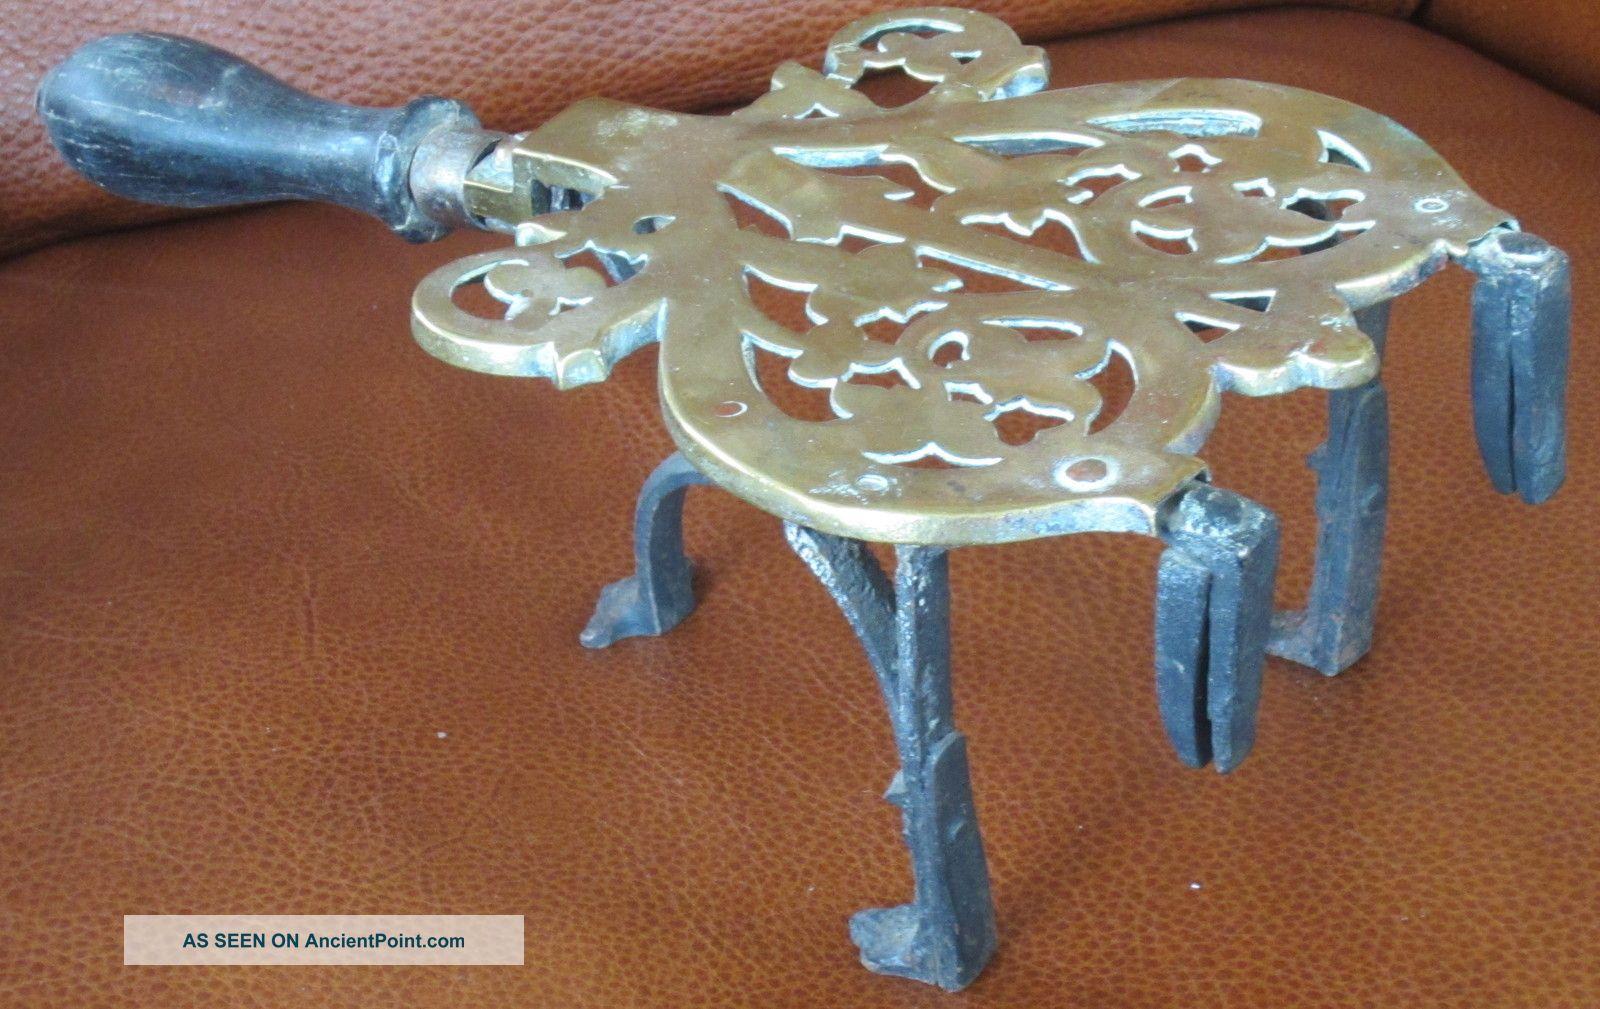 Antique Brass Wrought Iron Trivet 1800s Heart Shape Hearth Trivets photo